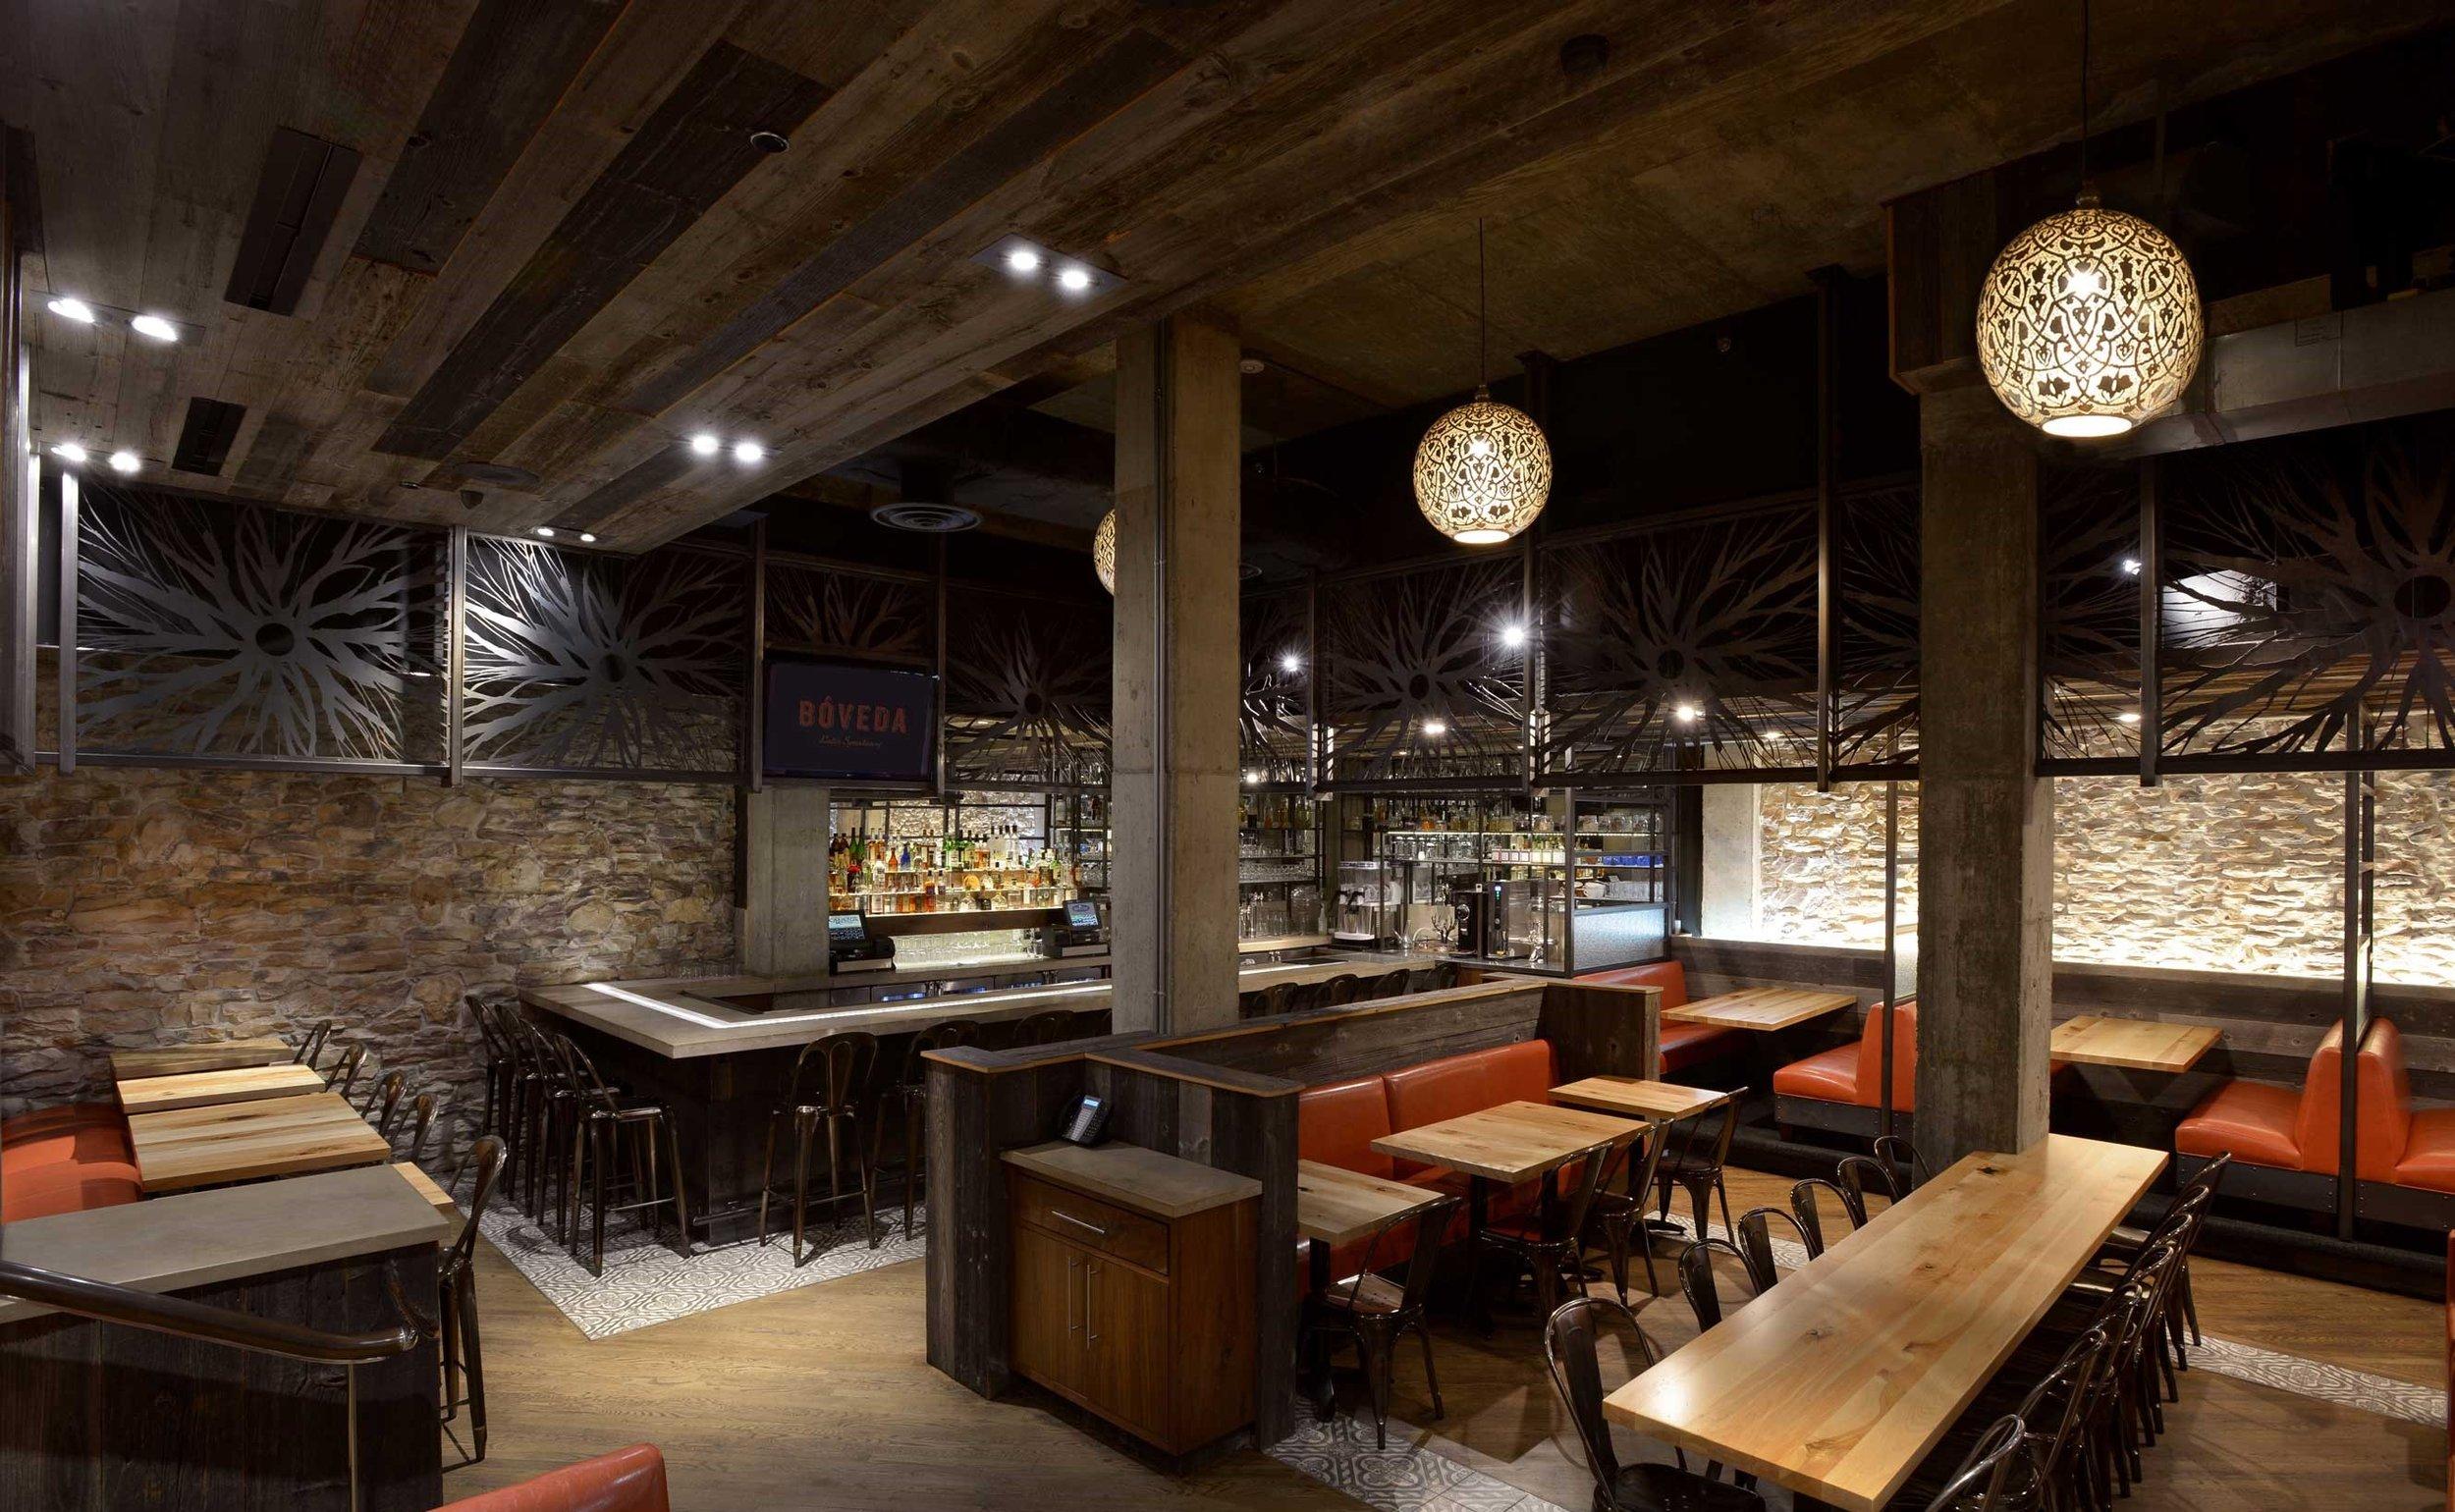 studio-saint-bars-and-restaurants-boveda-washington-dc-3